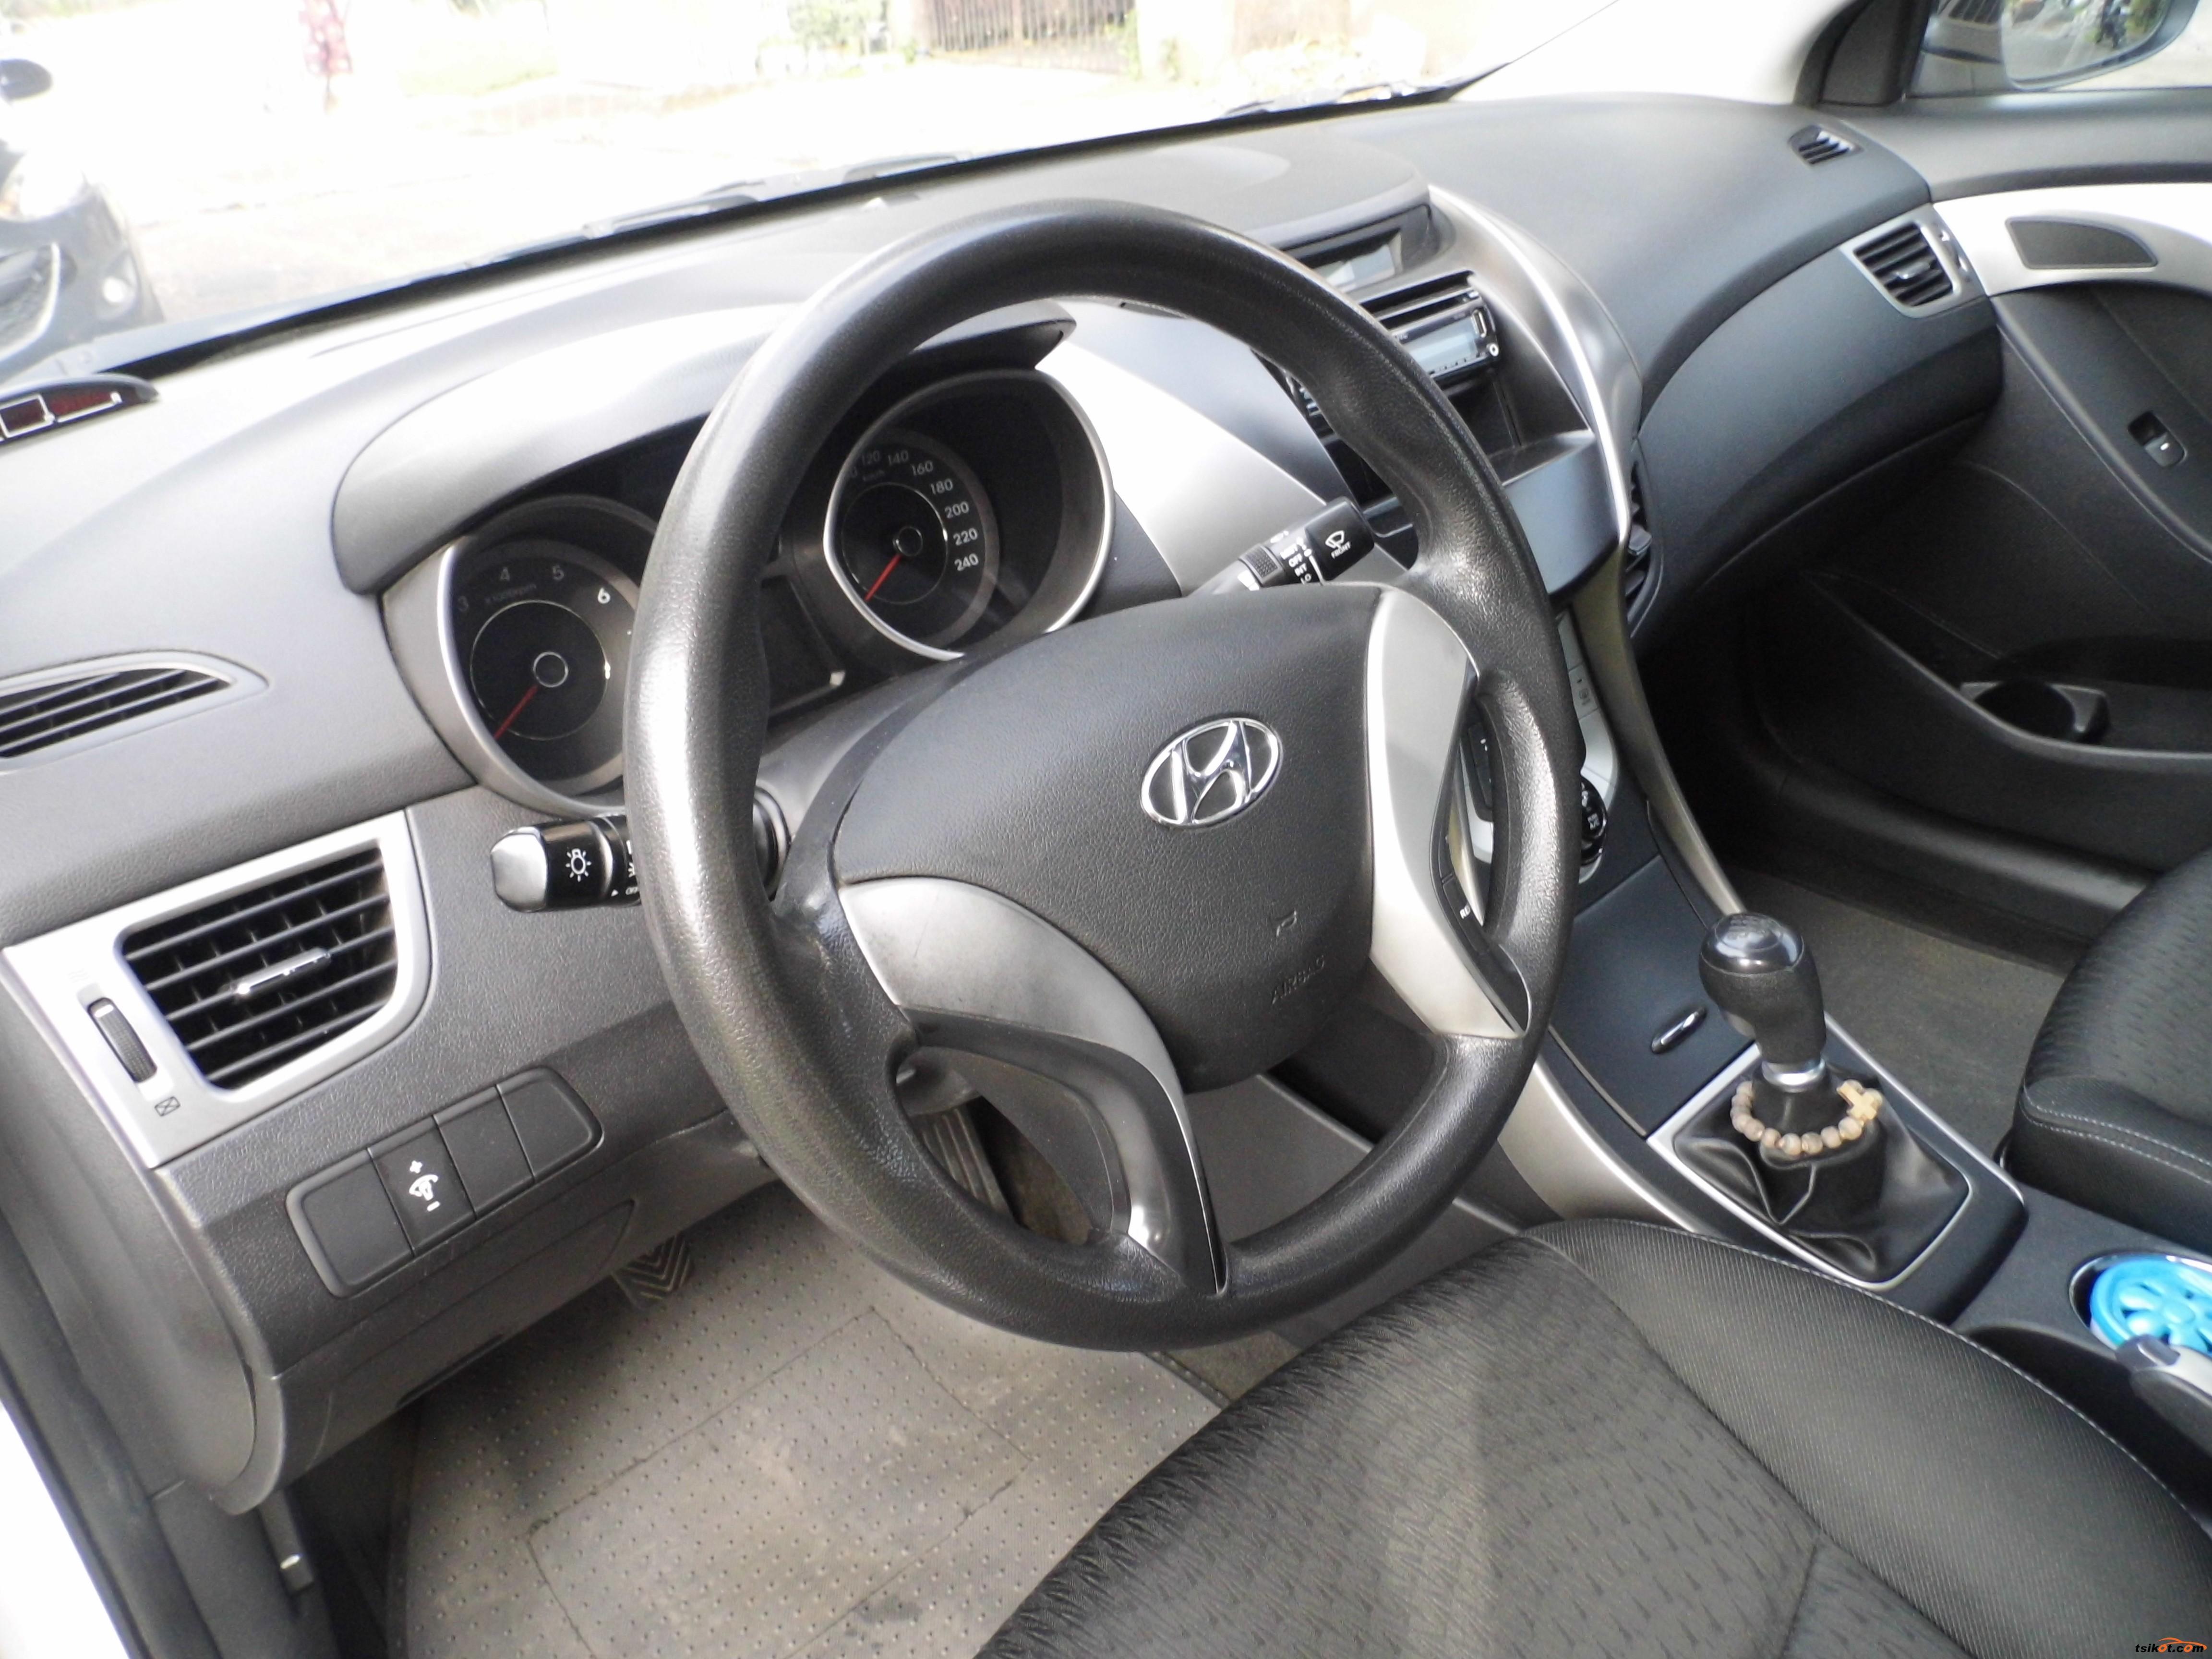 Hyundai Elantra 2012 - 7